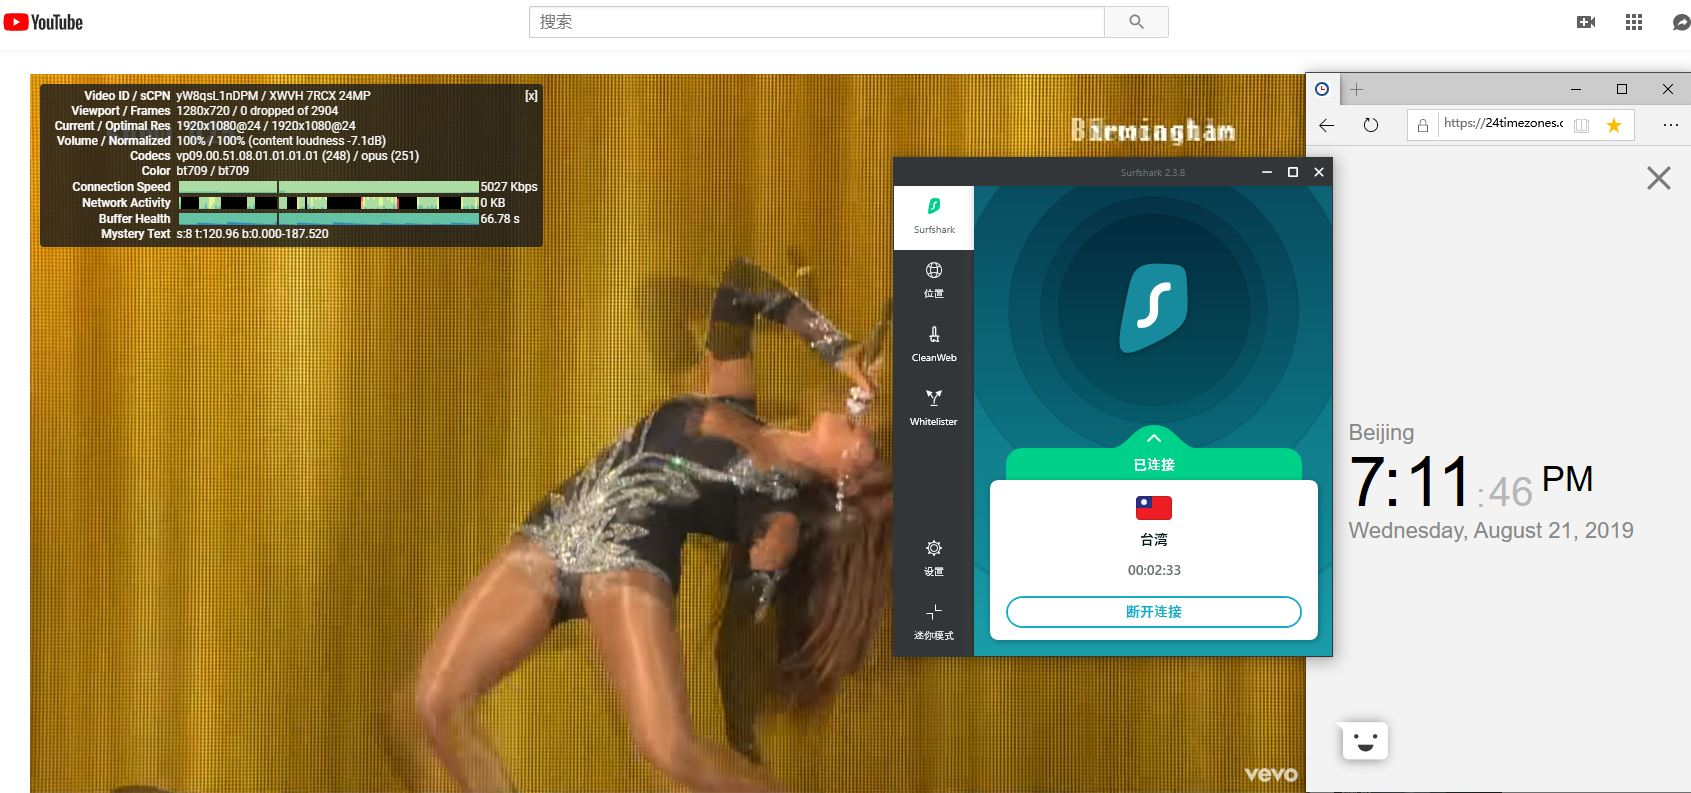 windows surfshark 台湾服务器 中国VPN翻墙 科学上网 YouTube测速-20190821